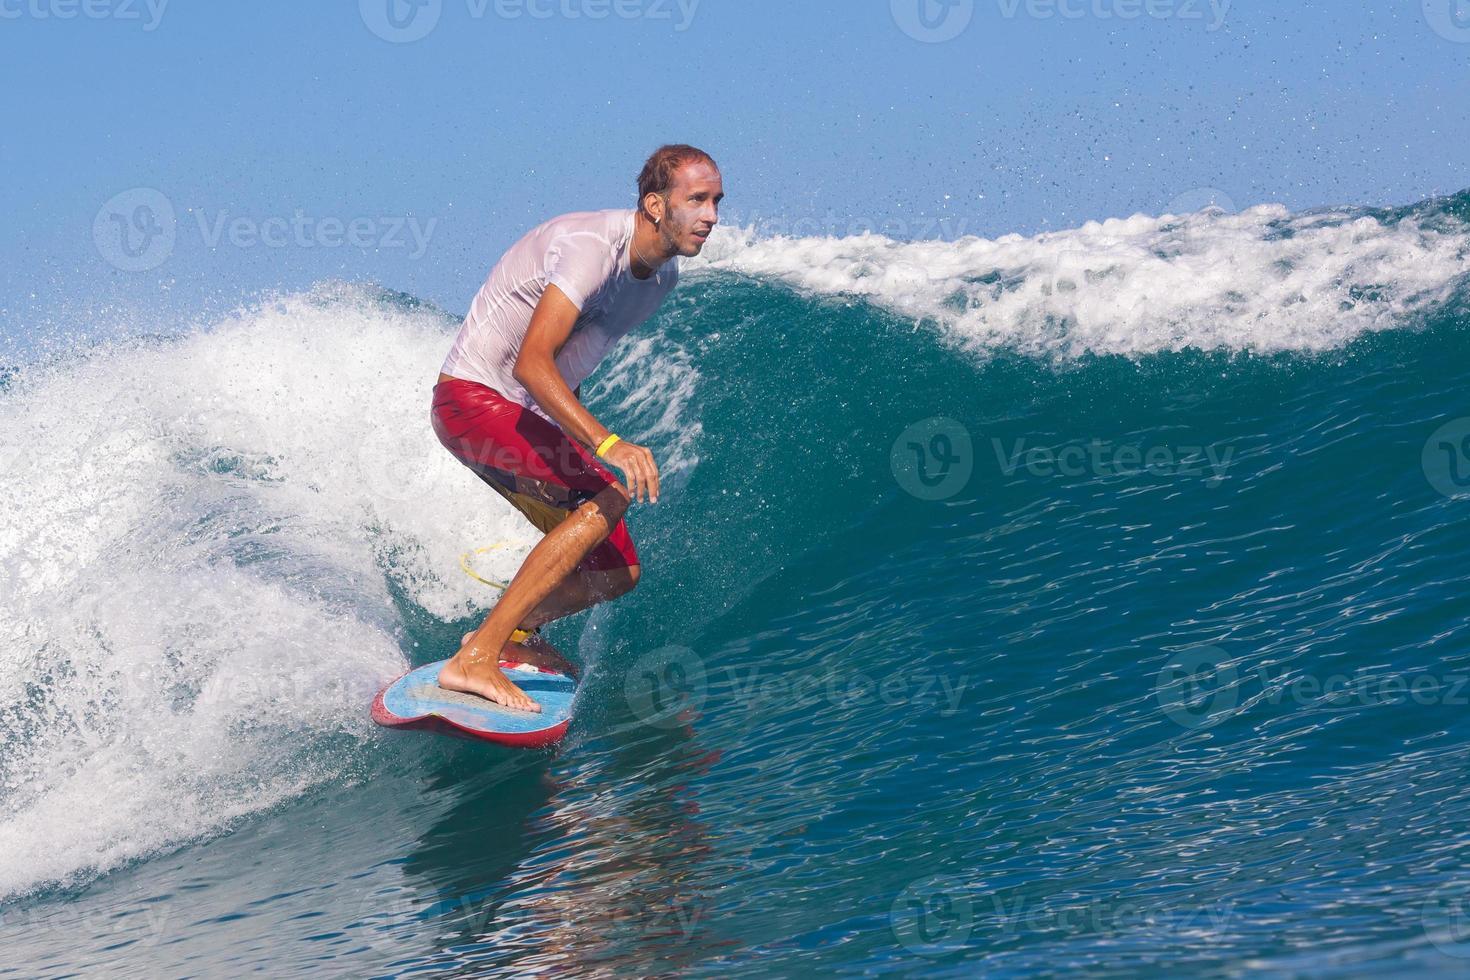 surfando uma onda. Ilha de Bali. Indonésia. foto